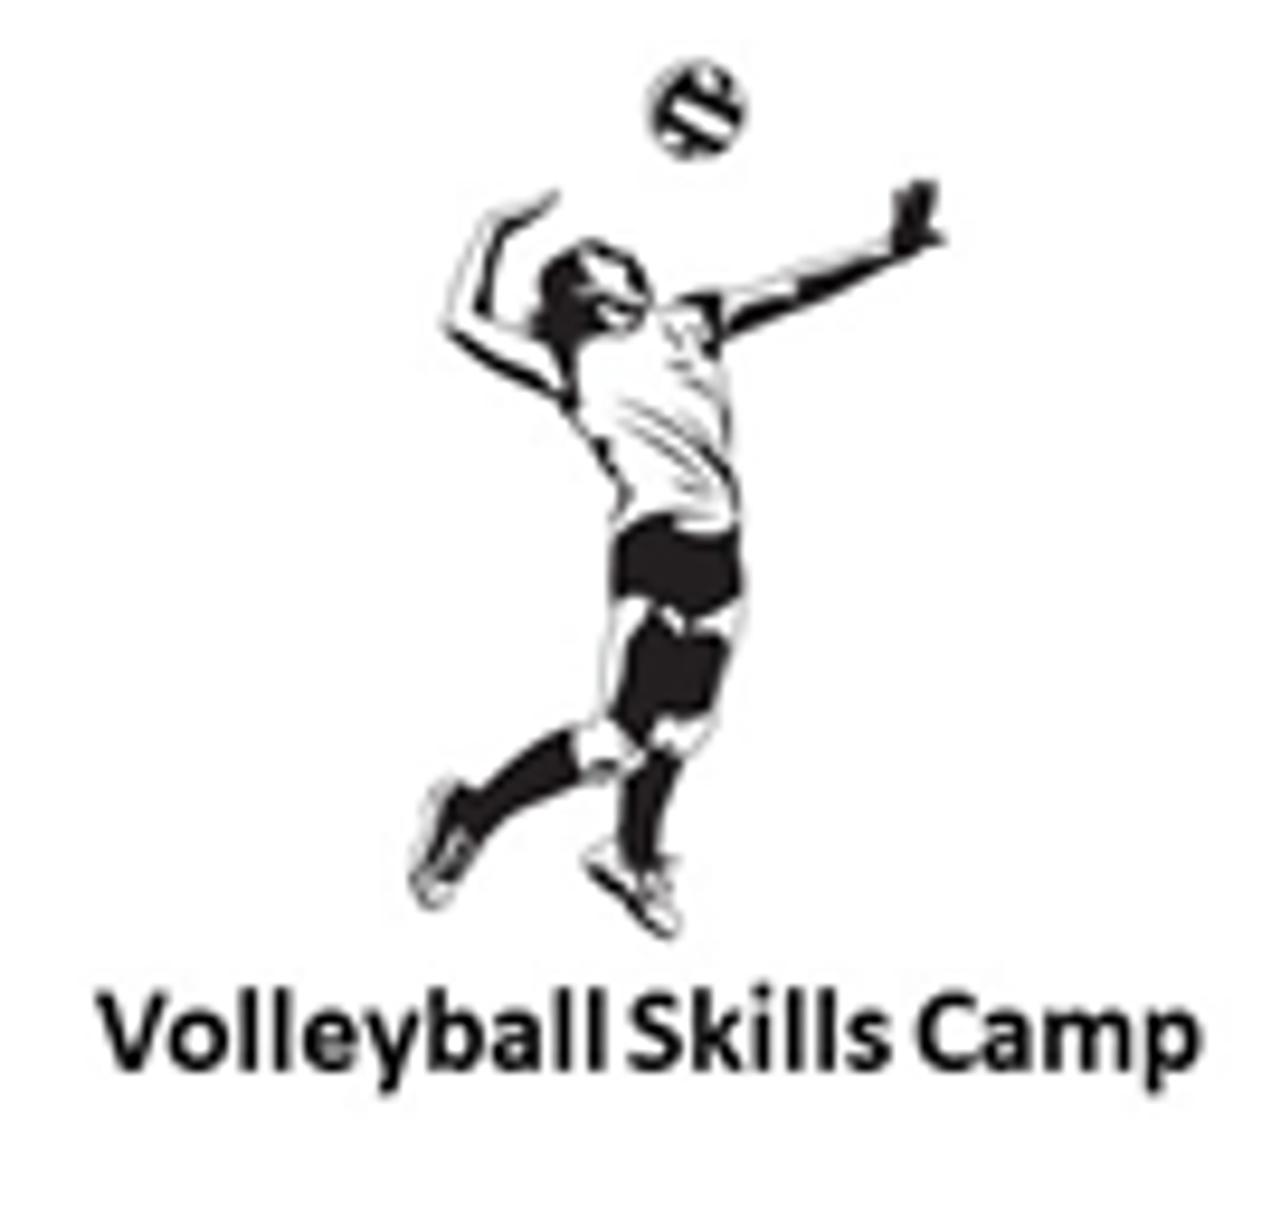 Volleyball Skills Camp $25-$75